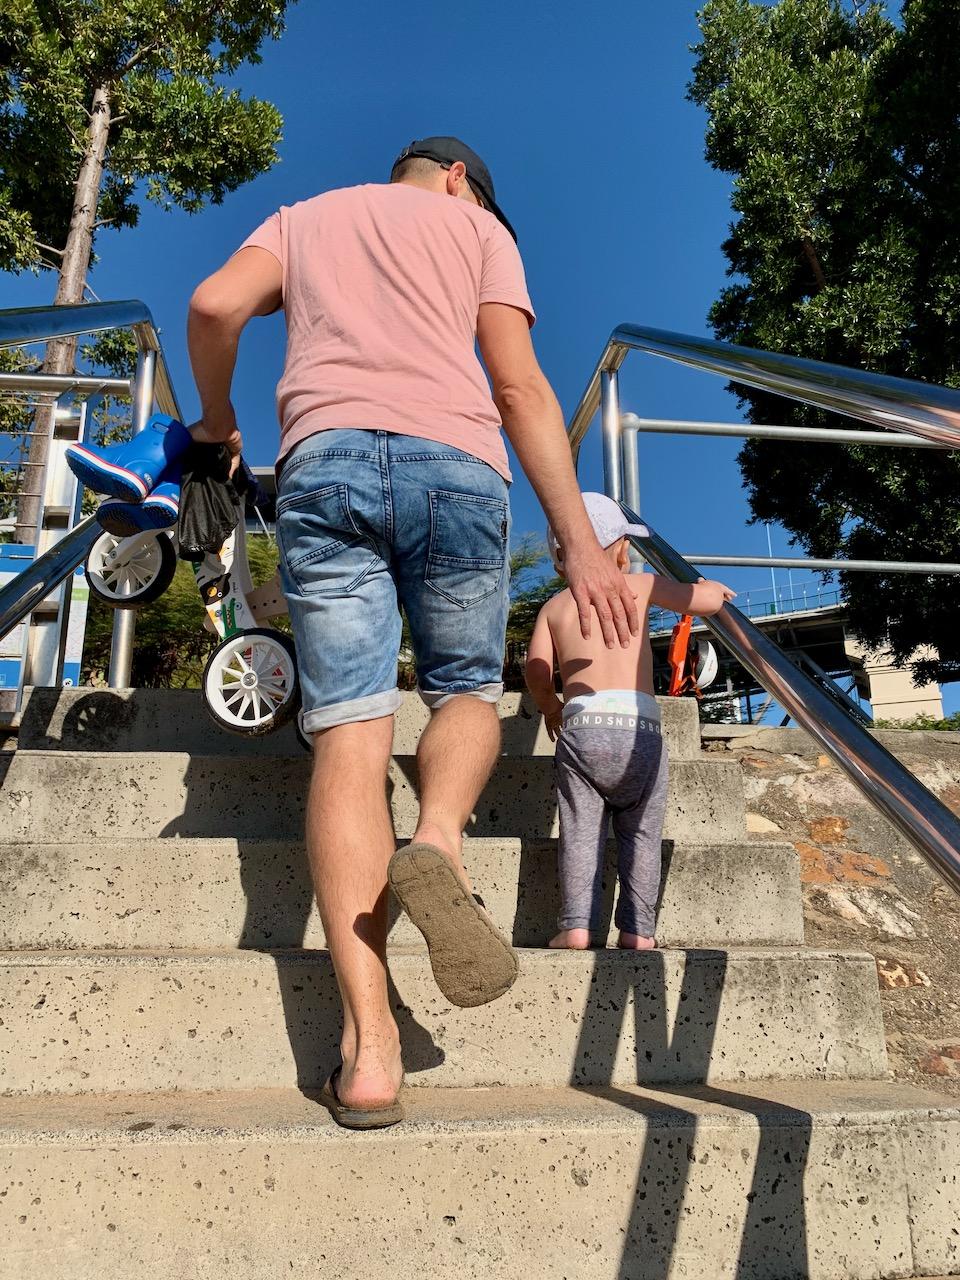 thewelltravelledfamily kangaroo point Brisbane inner-city dog-friendly beach